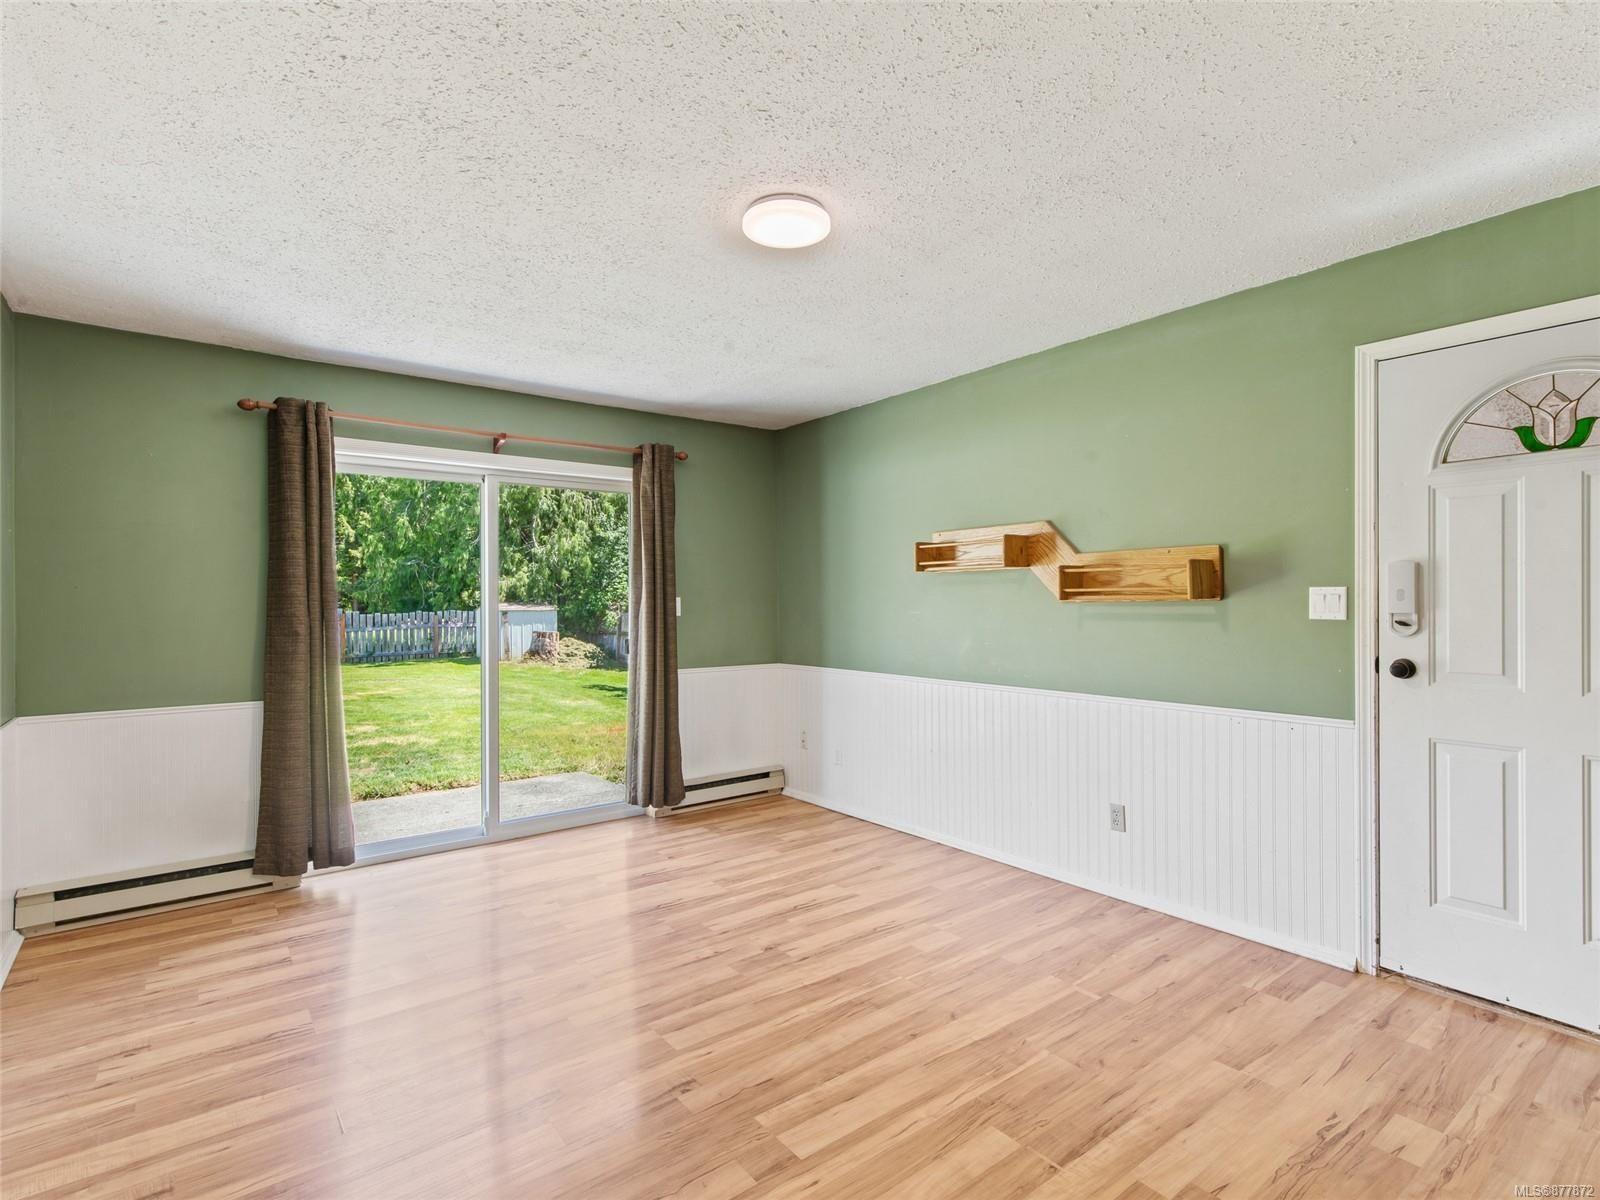 Photo 15: Photos: 7865 Wardrop Rd in : PA Port Alberni House for sale (Port Alberni)  : MLS®# 877872